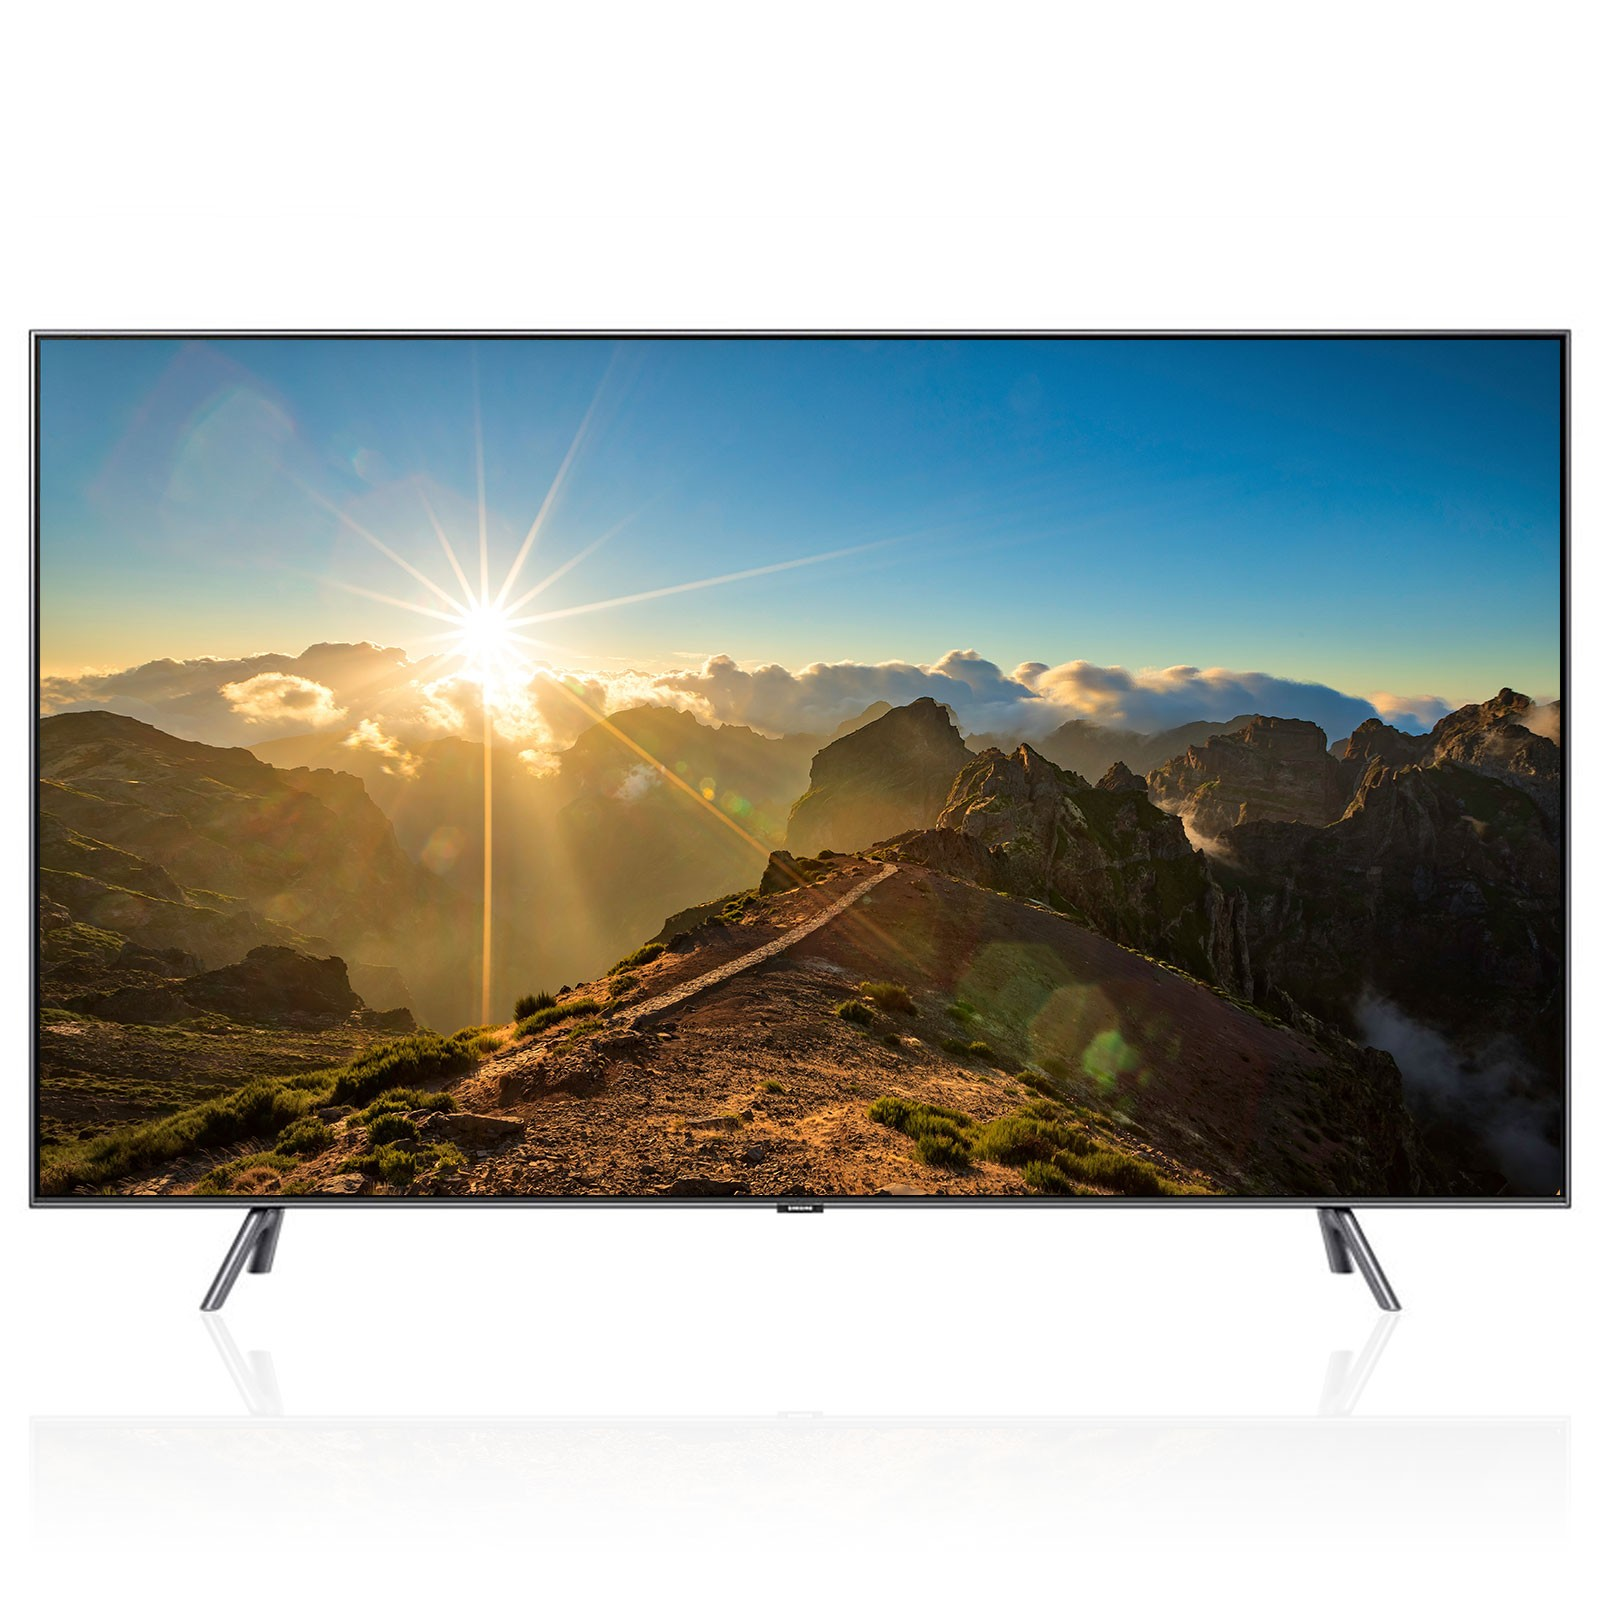 Samsung 75q8dna 75 Zoll 190cm Uhd 4k 3600pqi Qled Smart Tv Twin